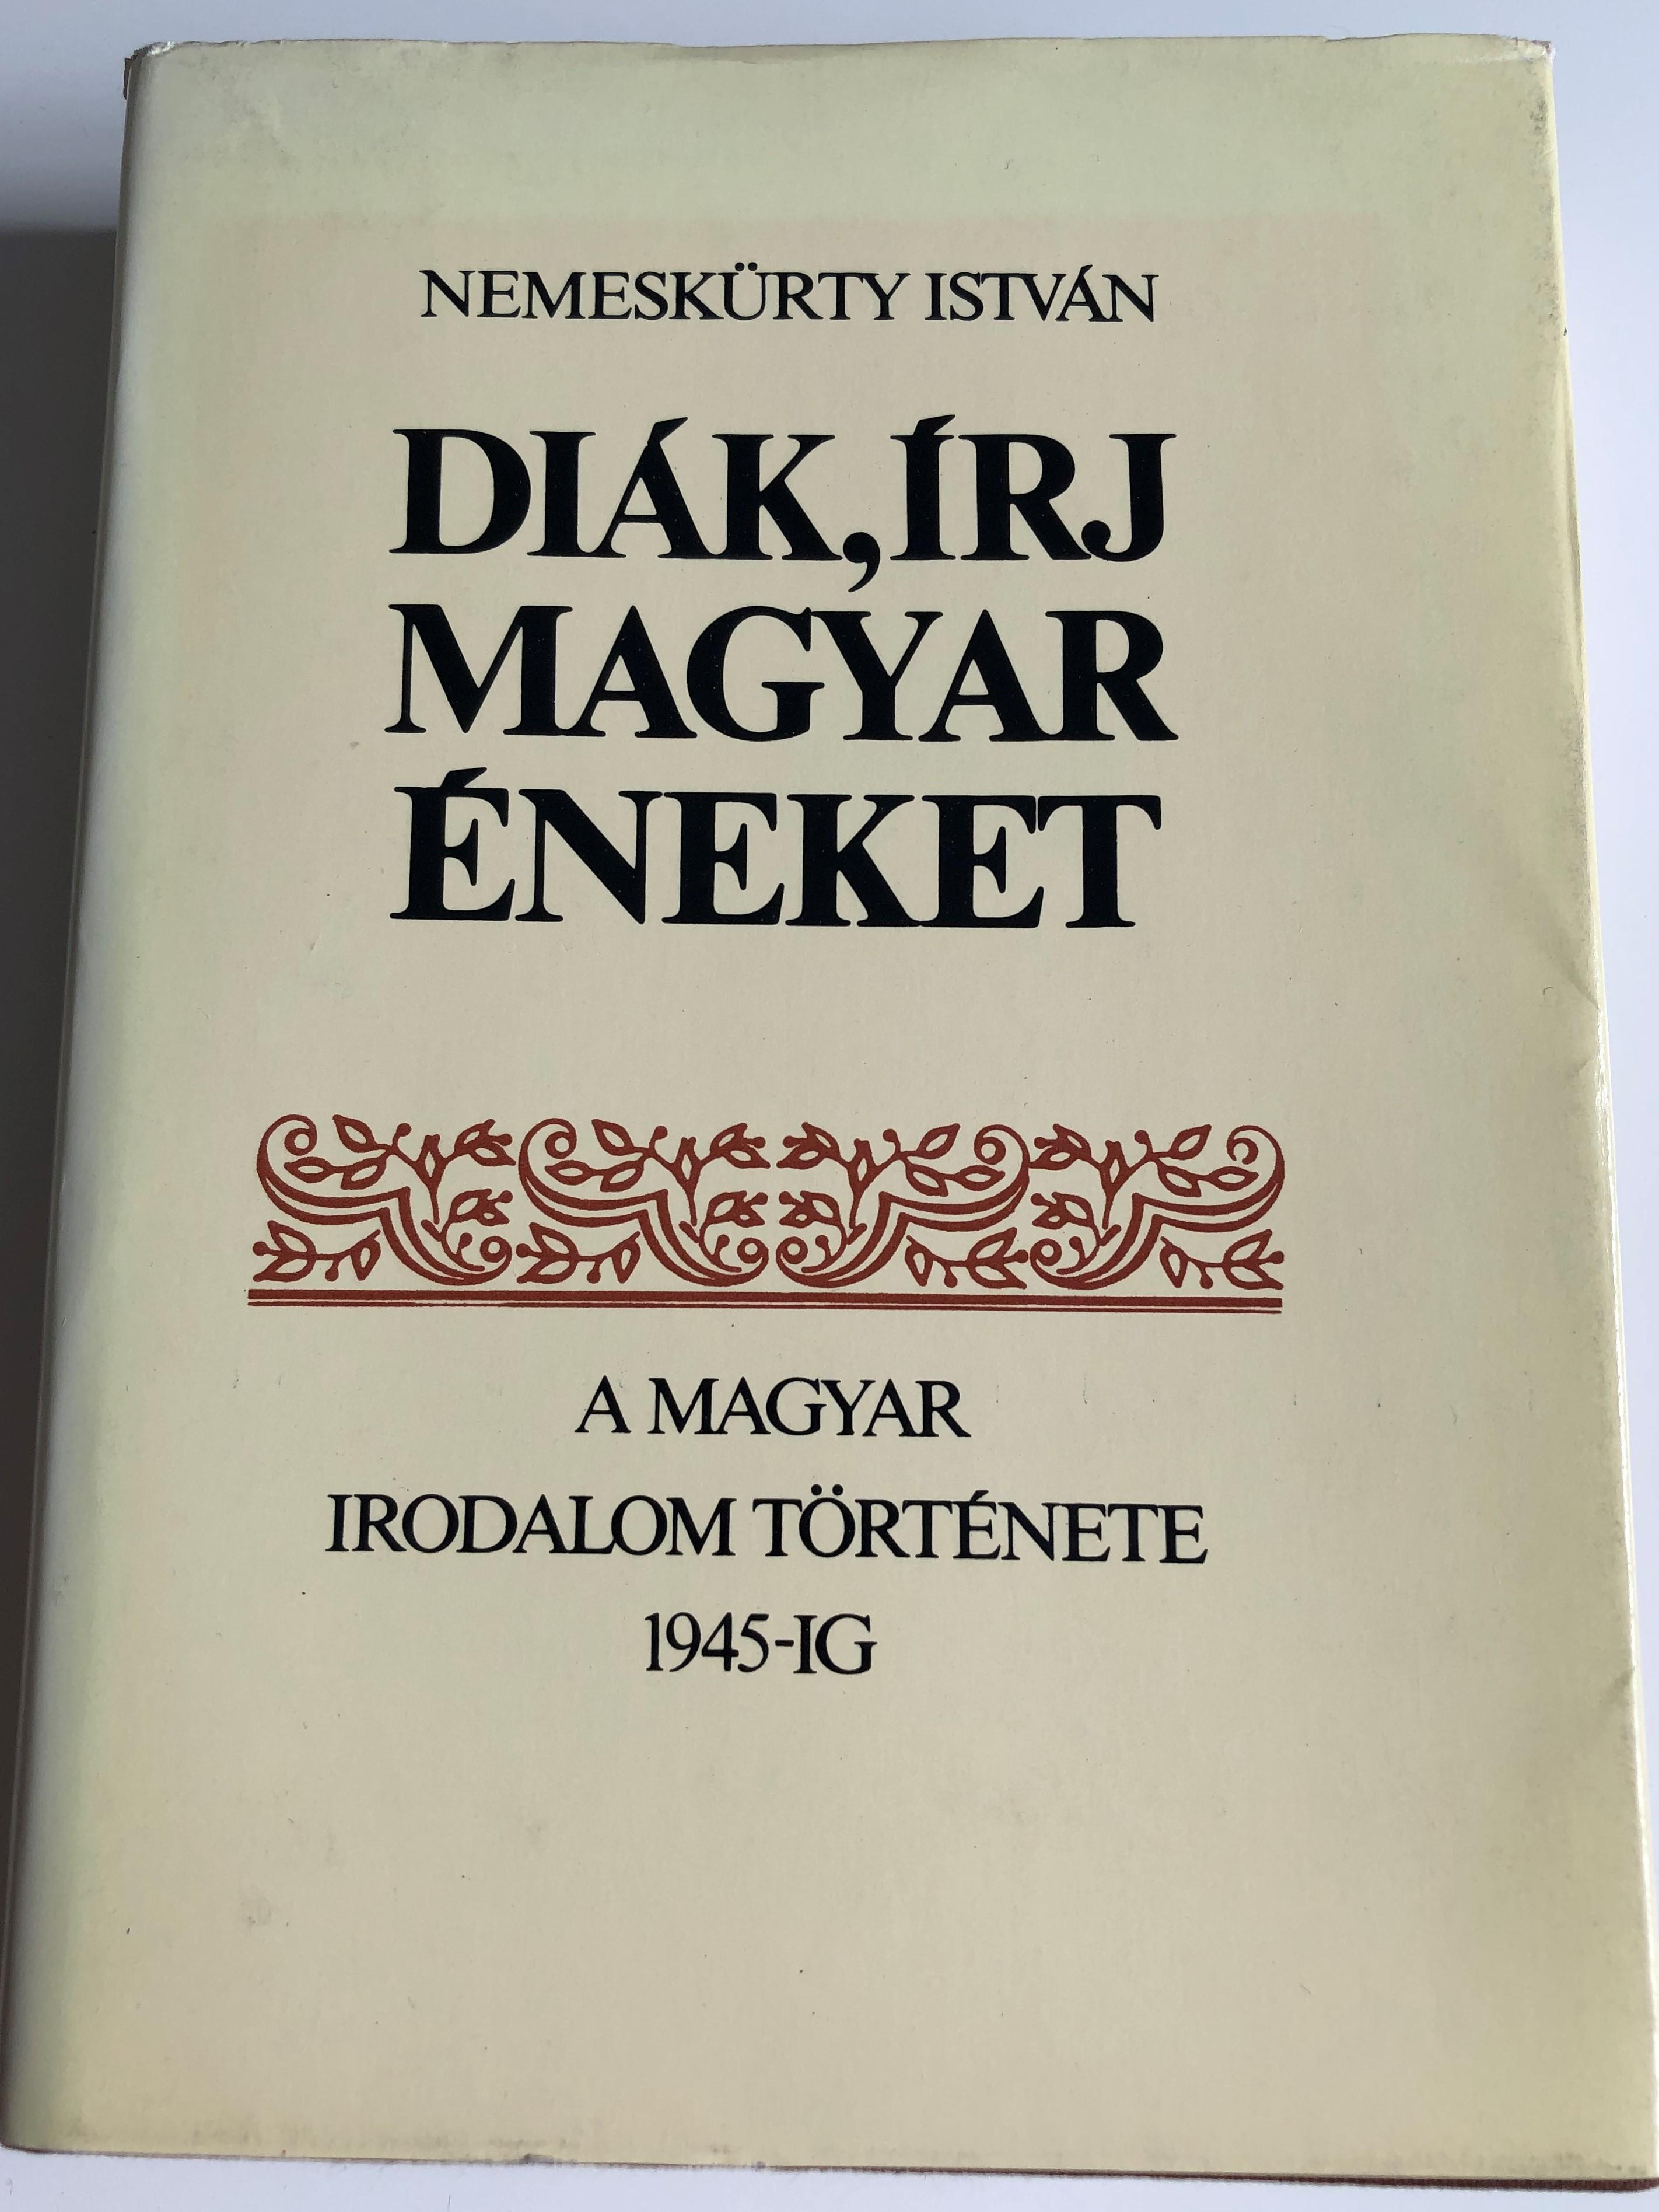 di-k-rj-magyar-neket-2-by-nemesk-rty-istv-n-a-magyar-irodalom-t-rt-nete-1945-ig-history-of-hungarian-literature-up-to-1945-volume-ii.-gondolat-1983-1-.jpg